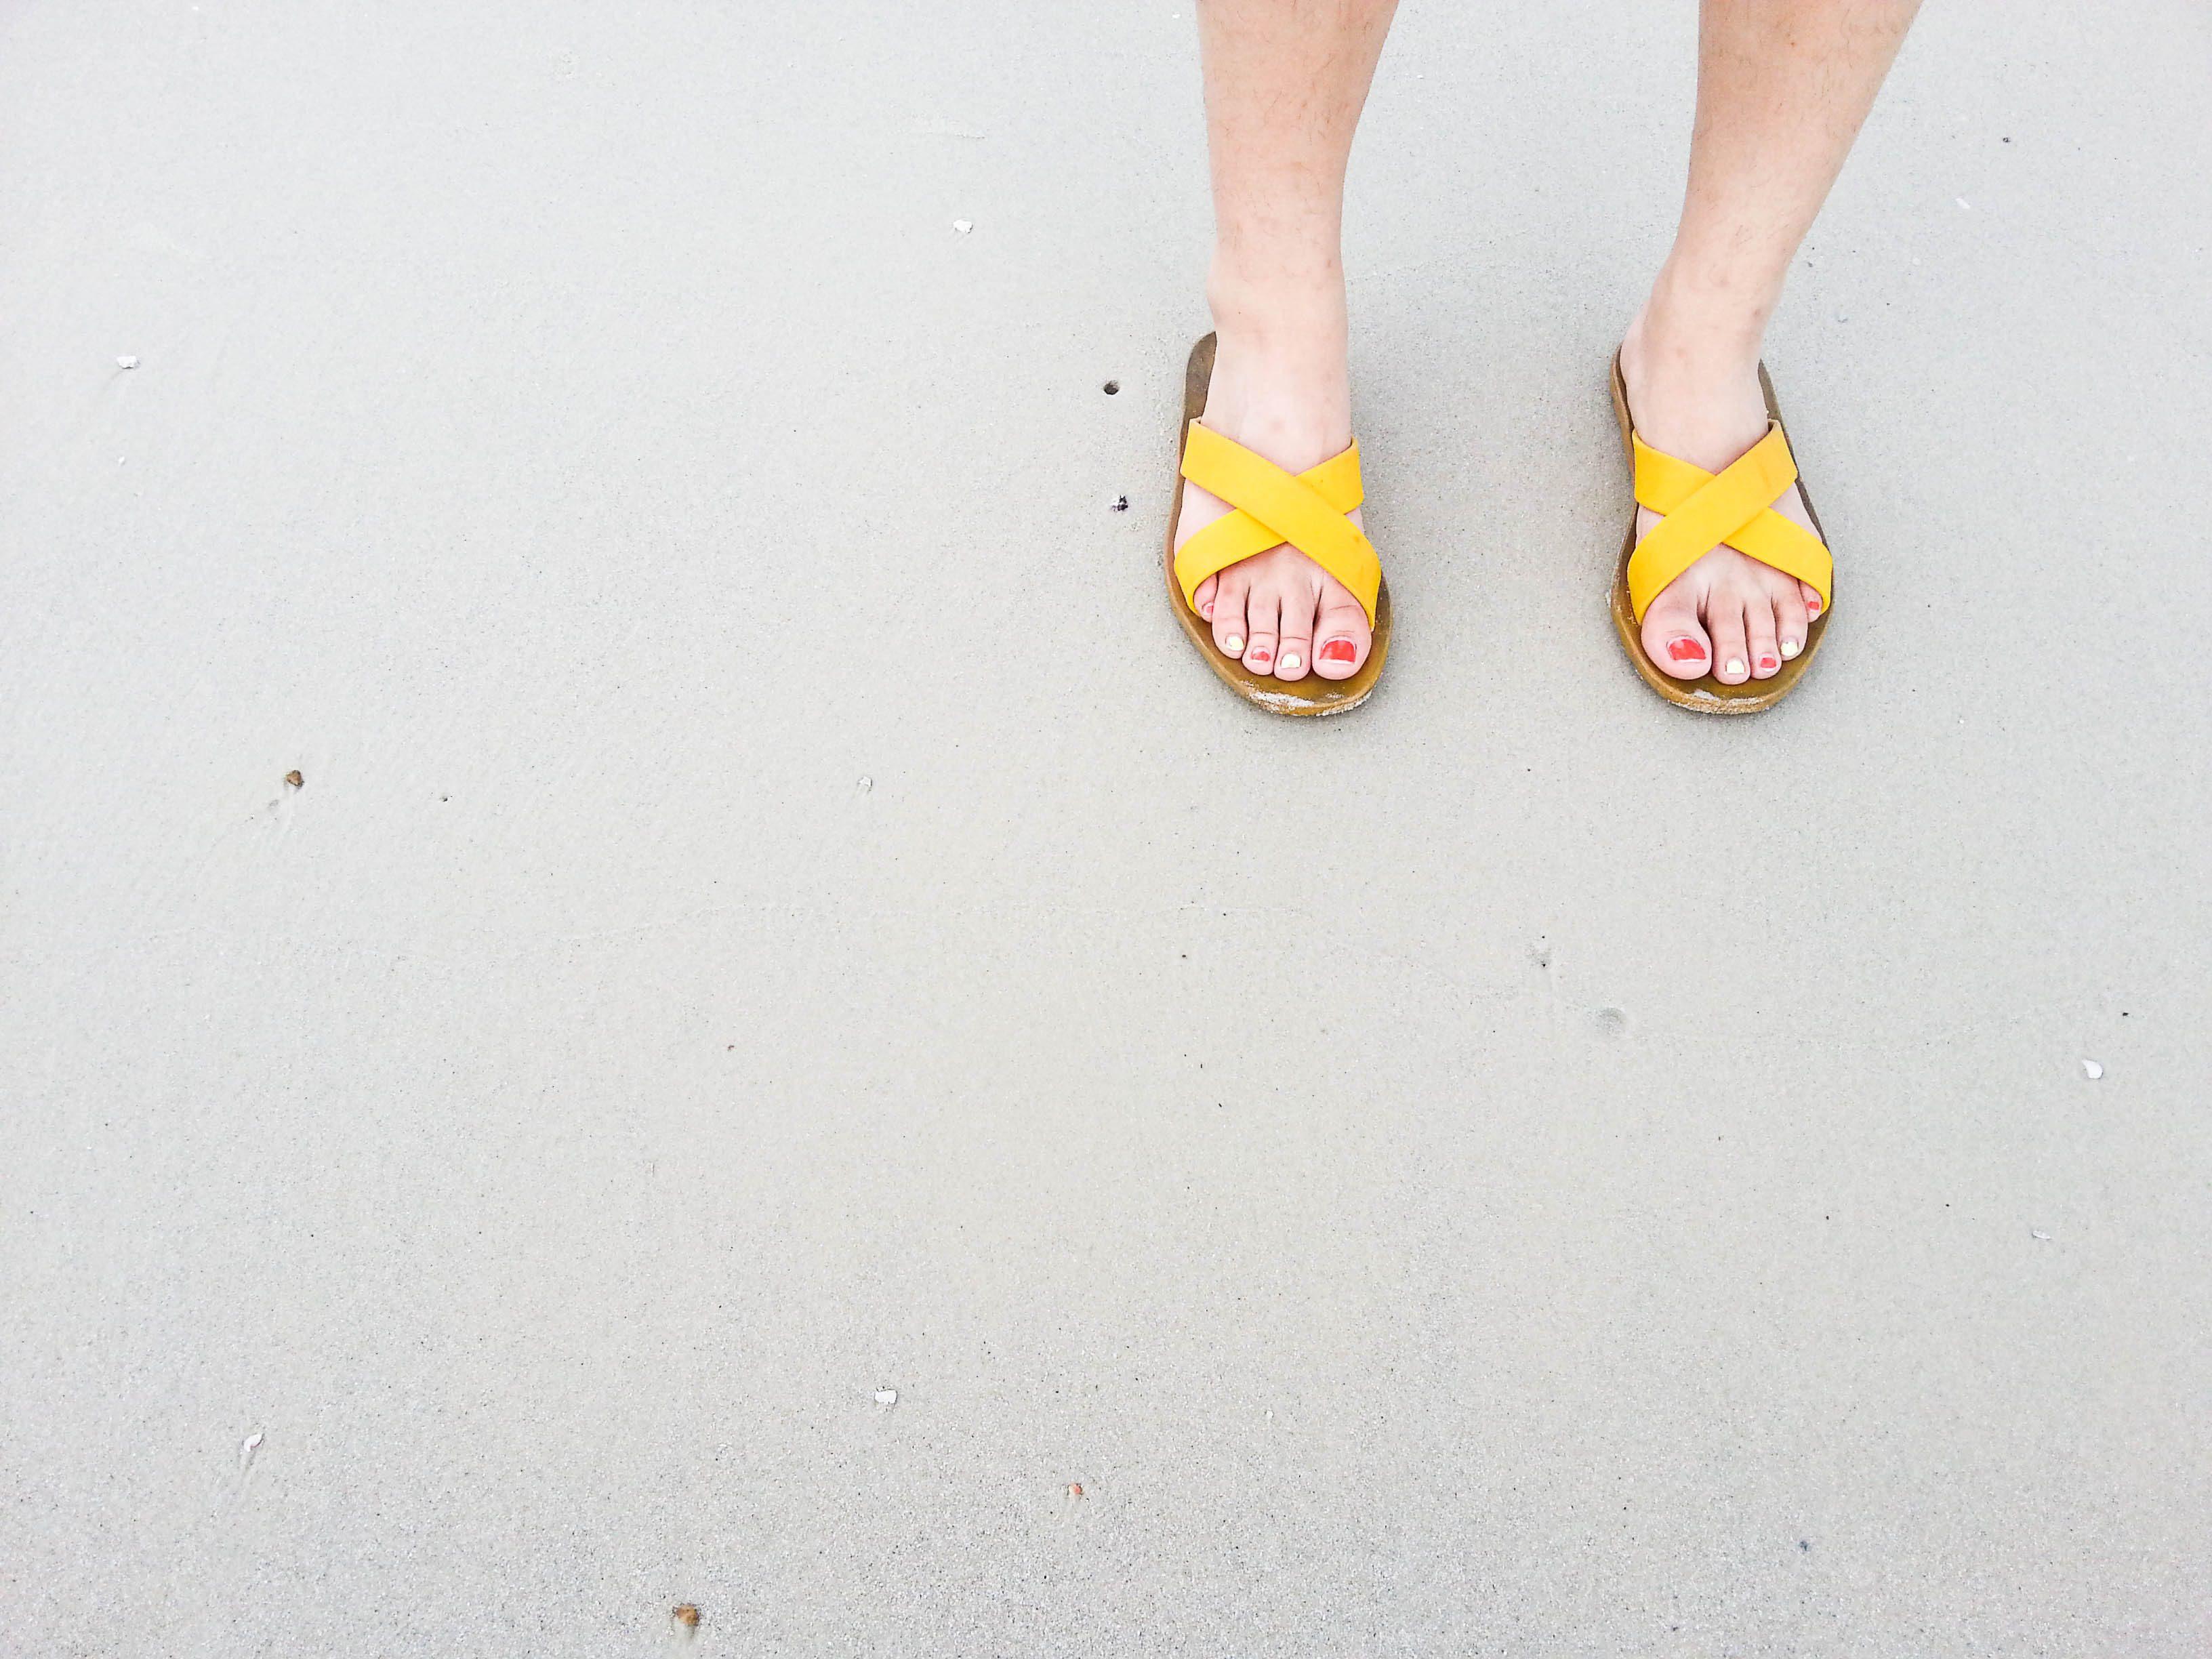 woman wearing yellow sandals